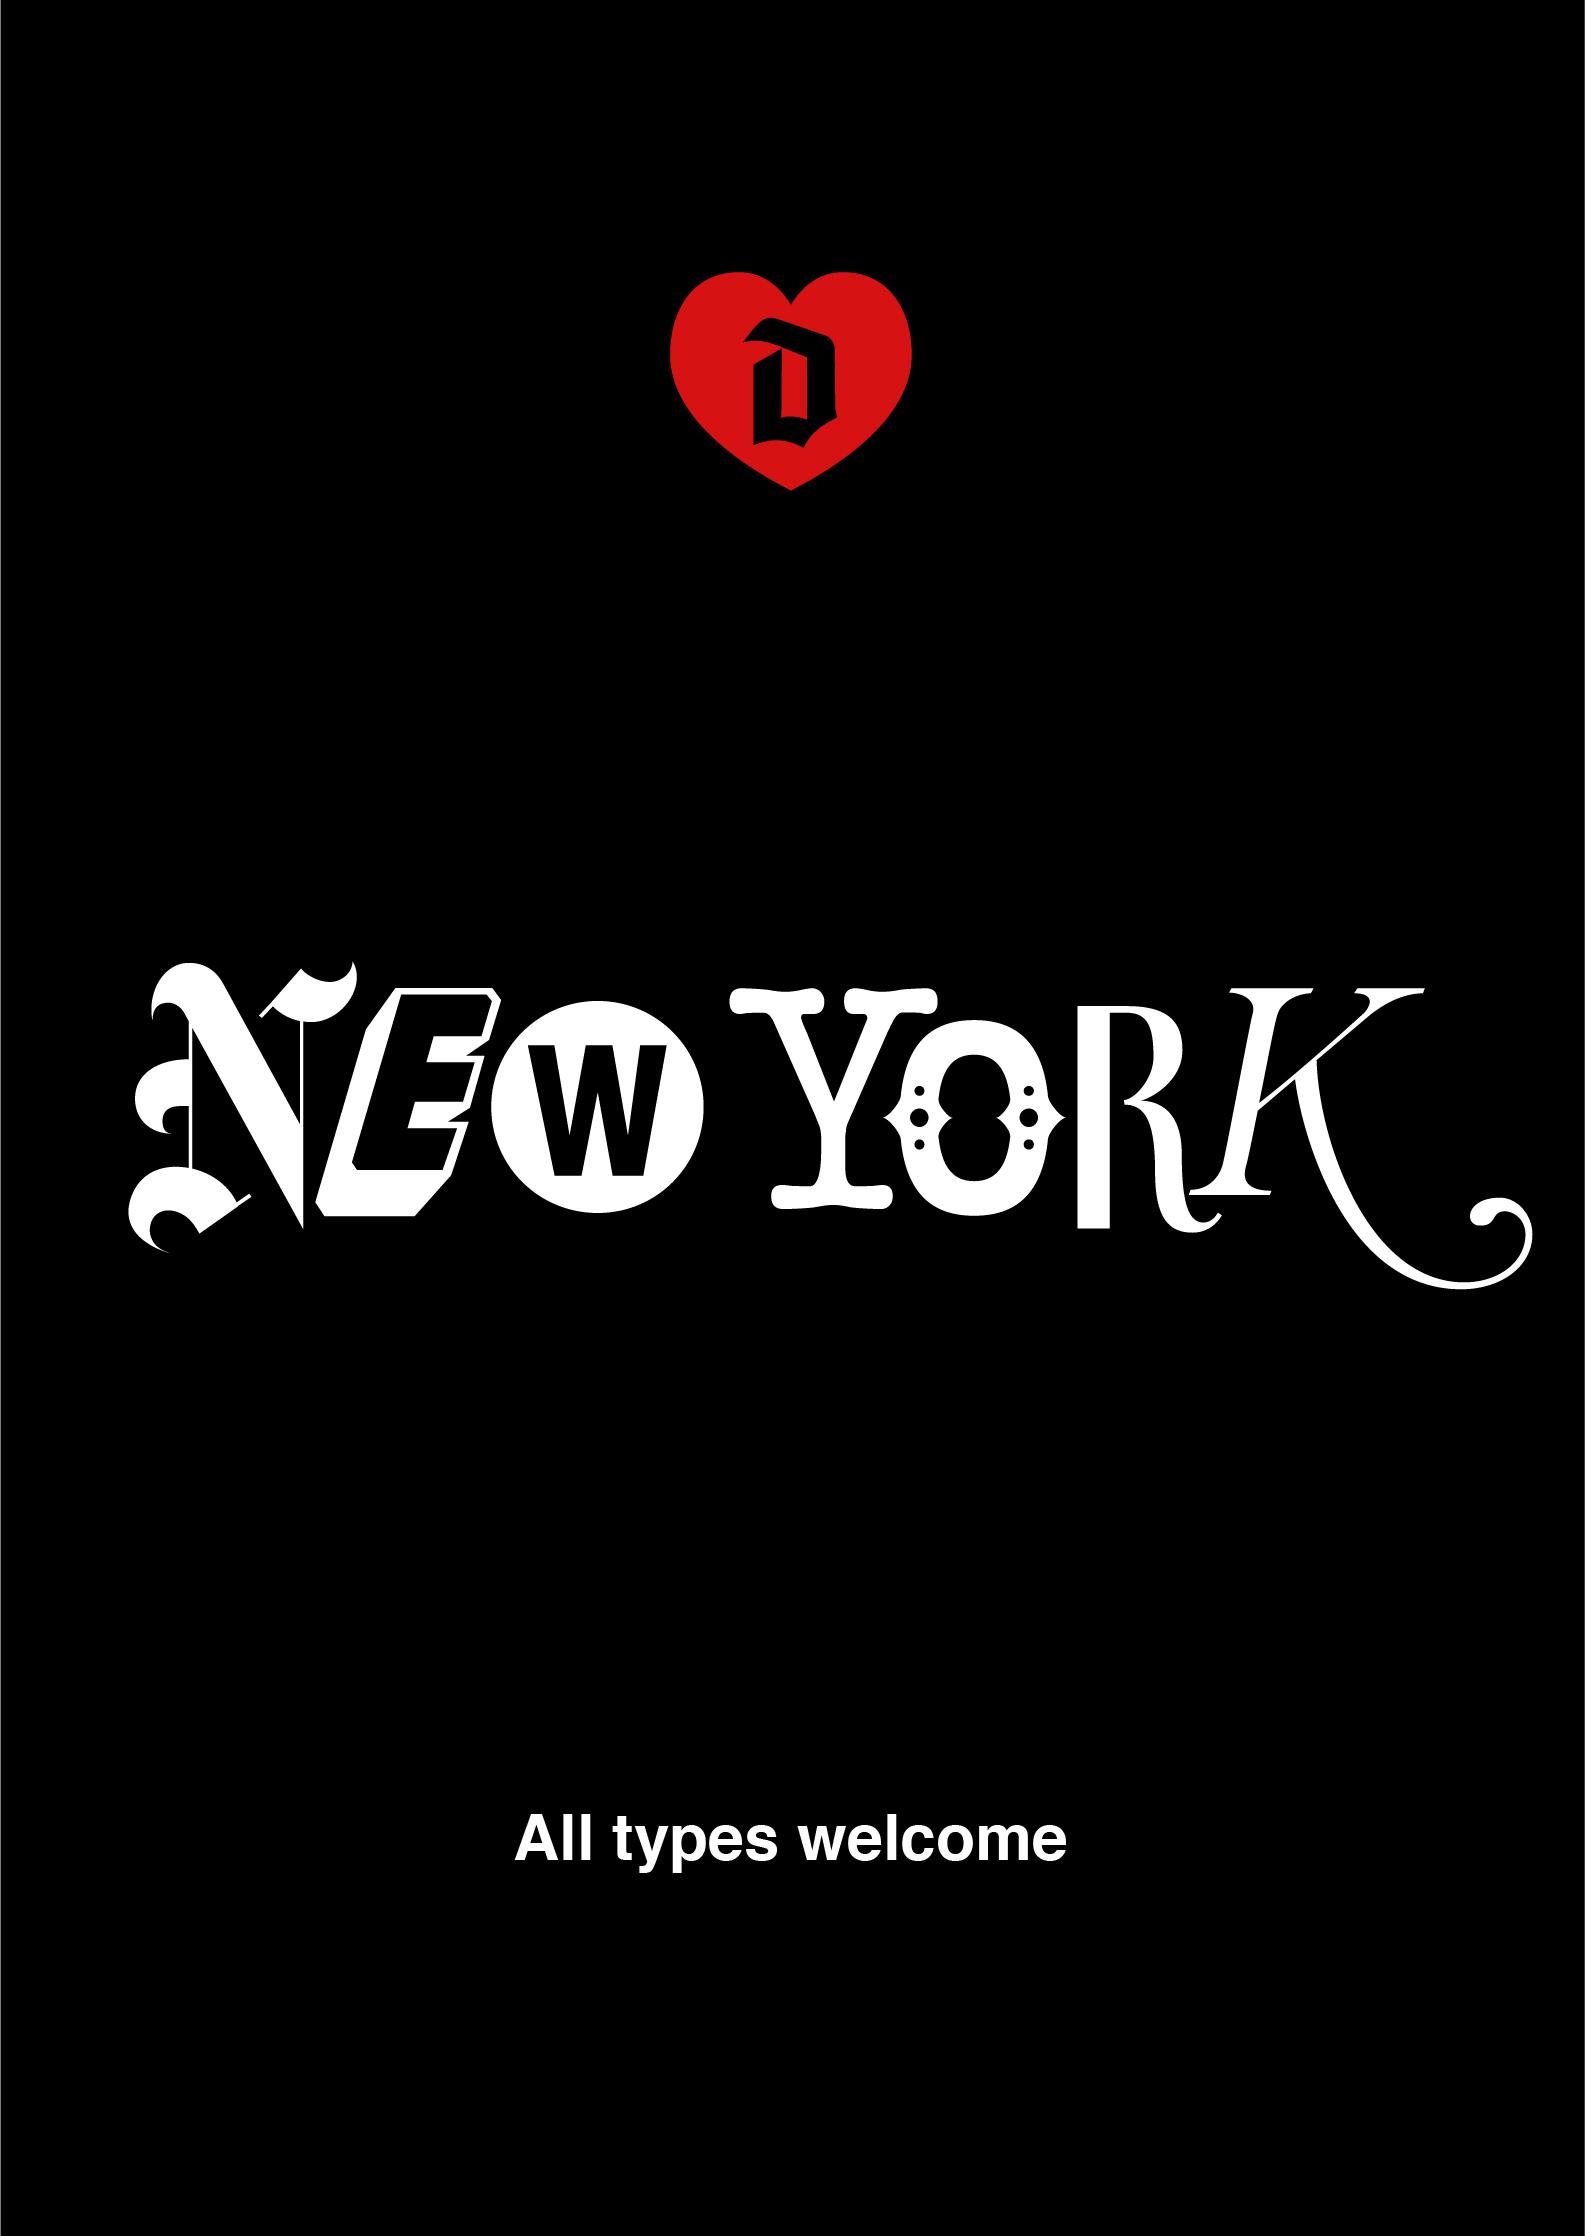 jkmt_Jack-Roizental_SUYT_Duvel_NYC_396x559.jpg